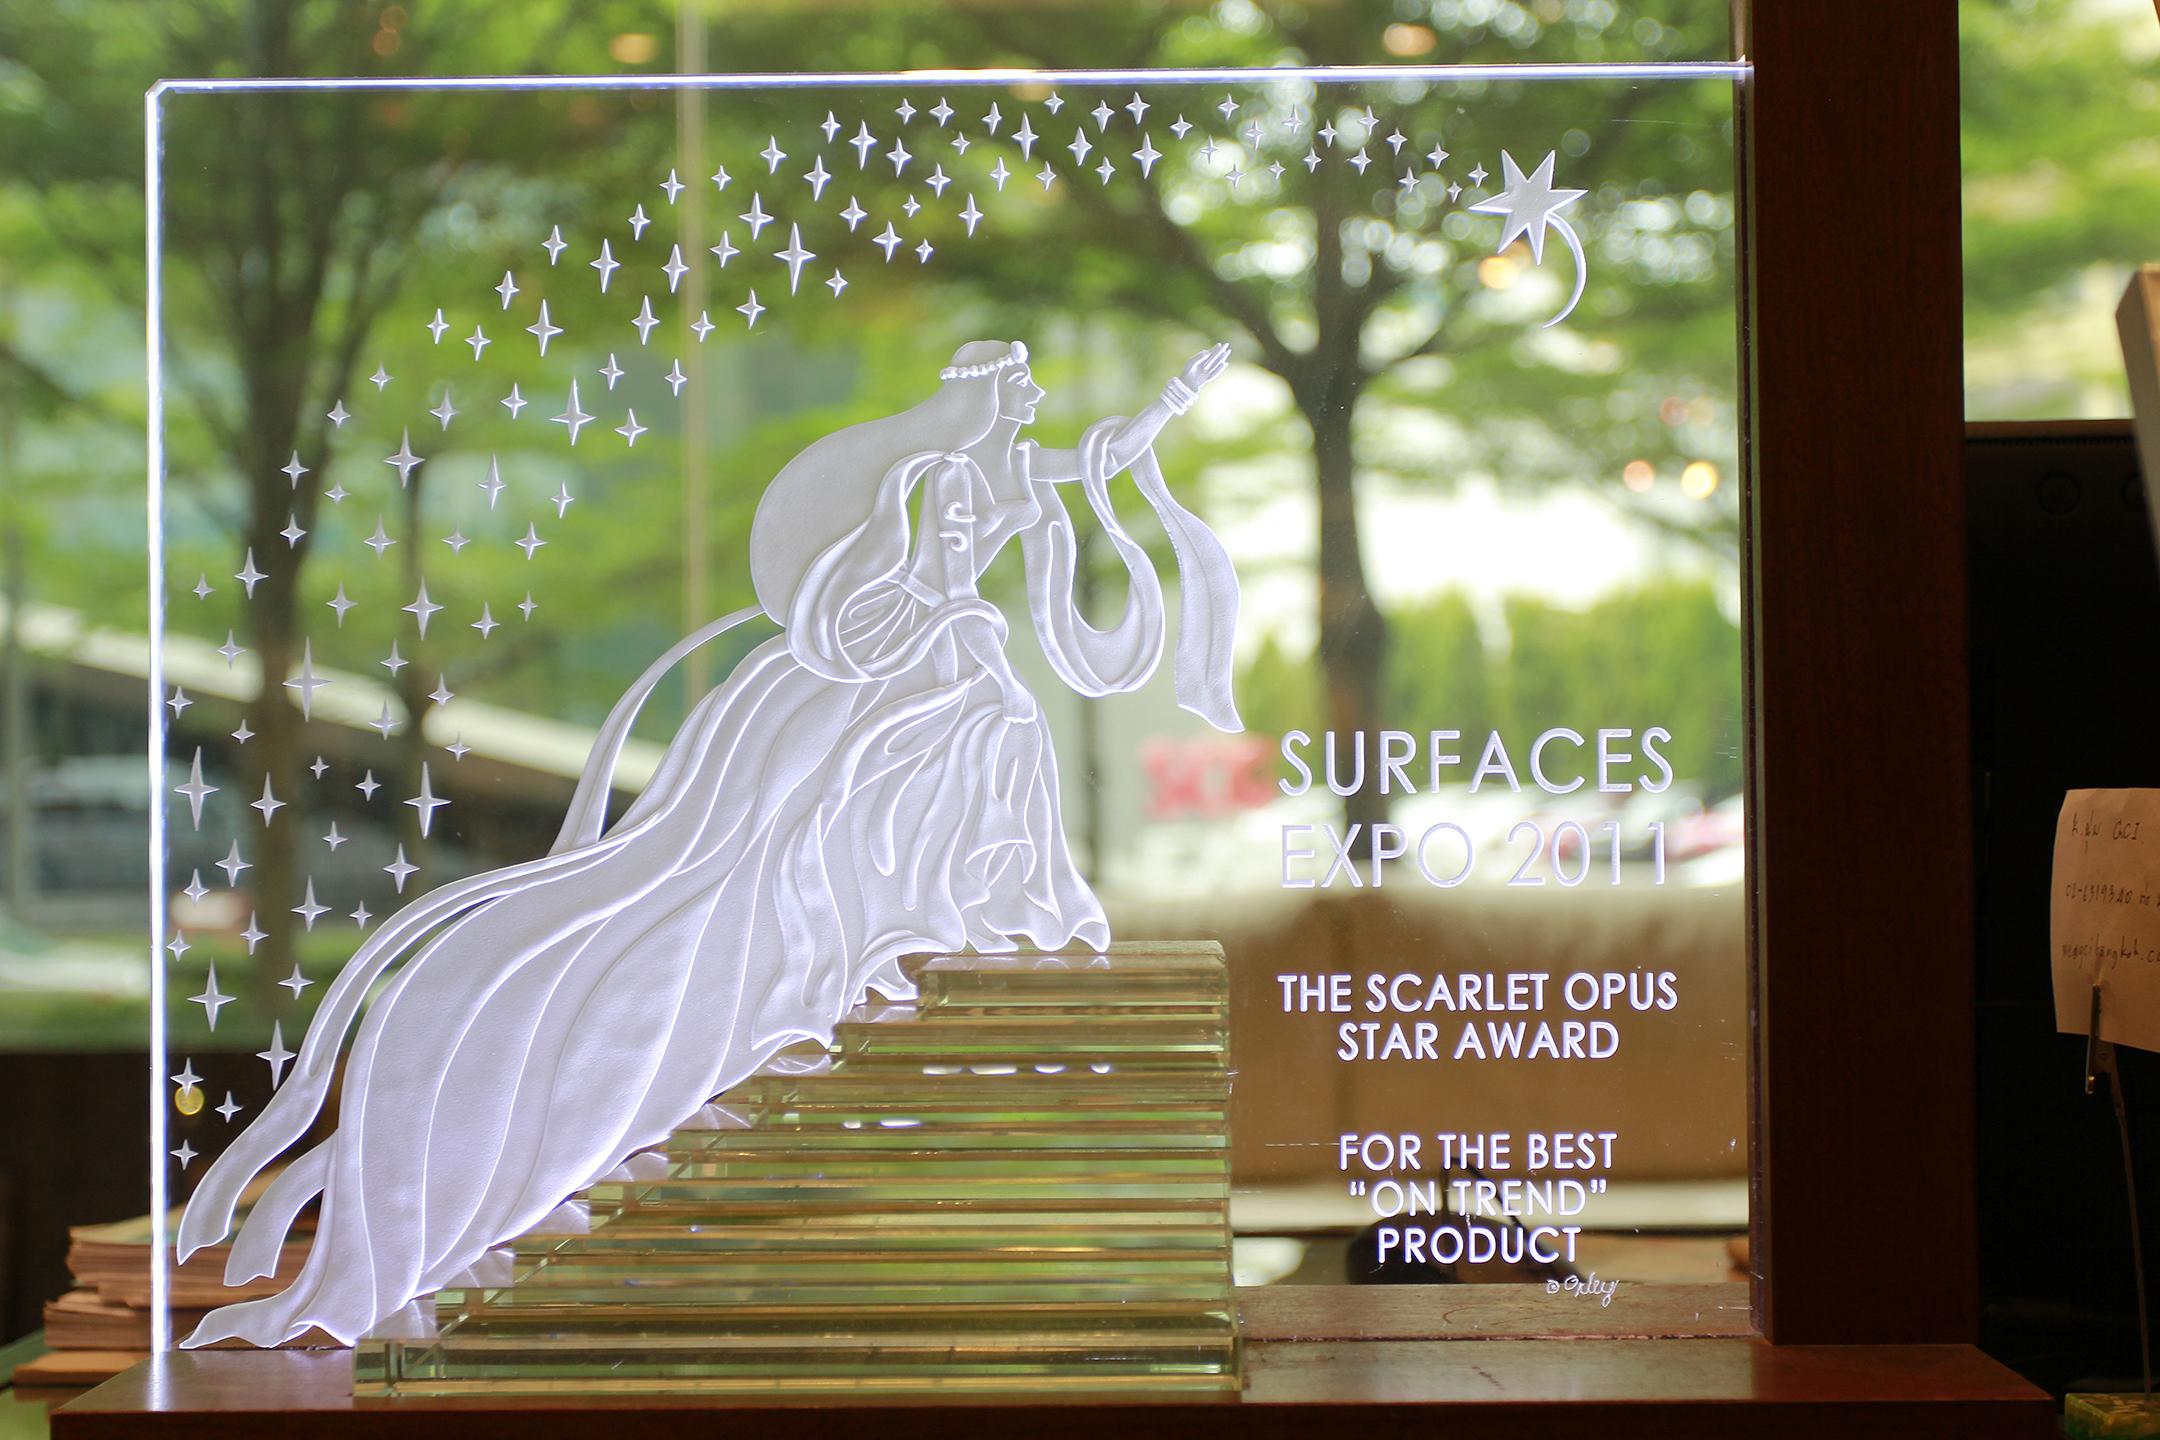 The Scarlet Opus Star Award